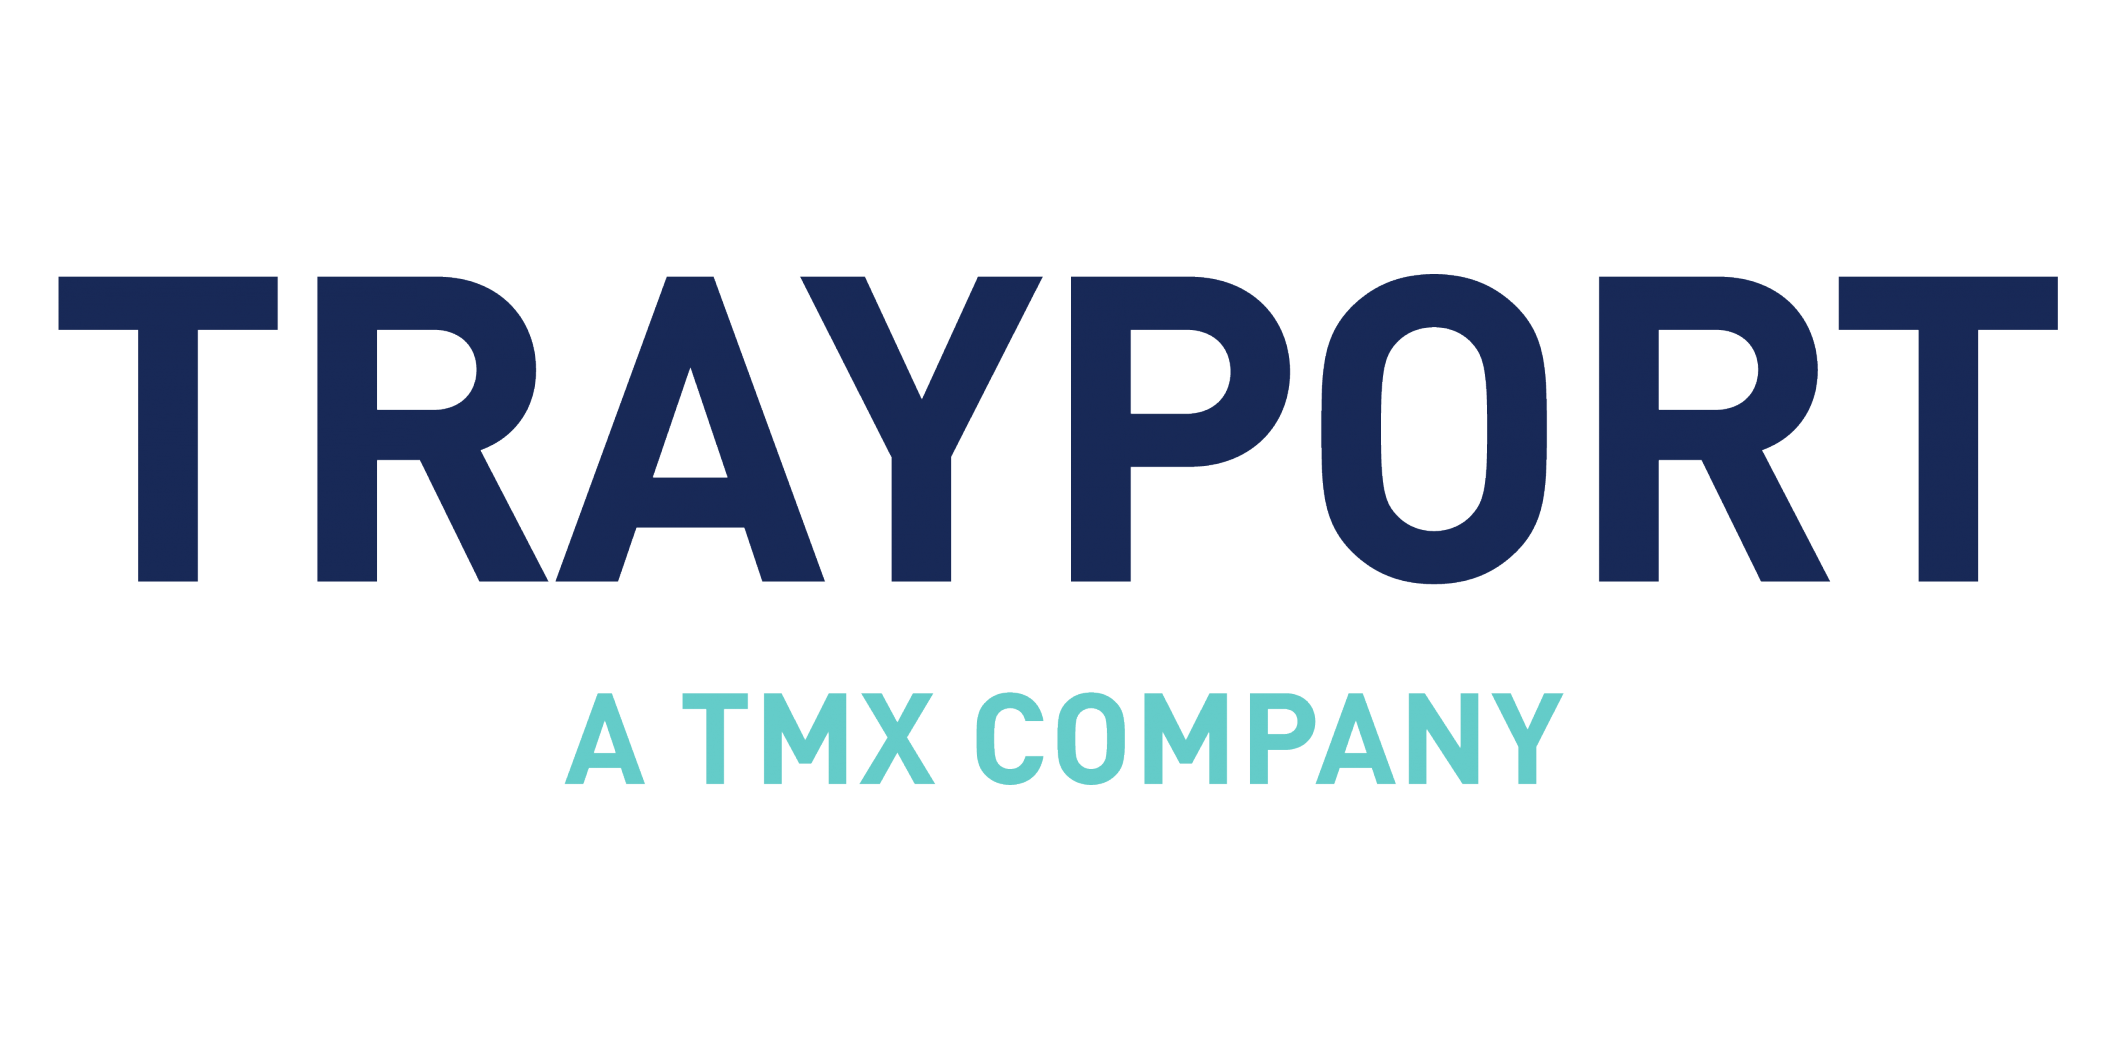 Trayport Announces Acquisition of Tradesignal